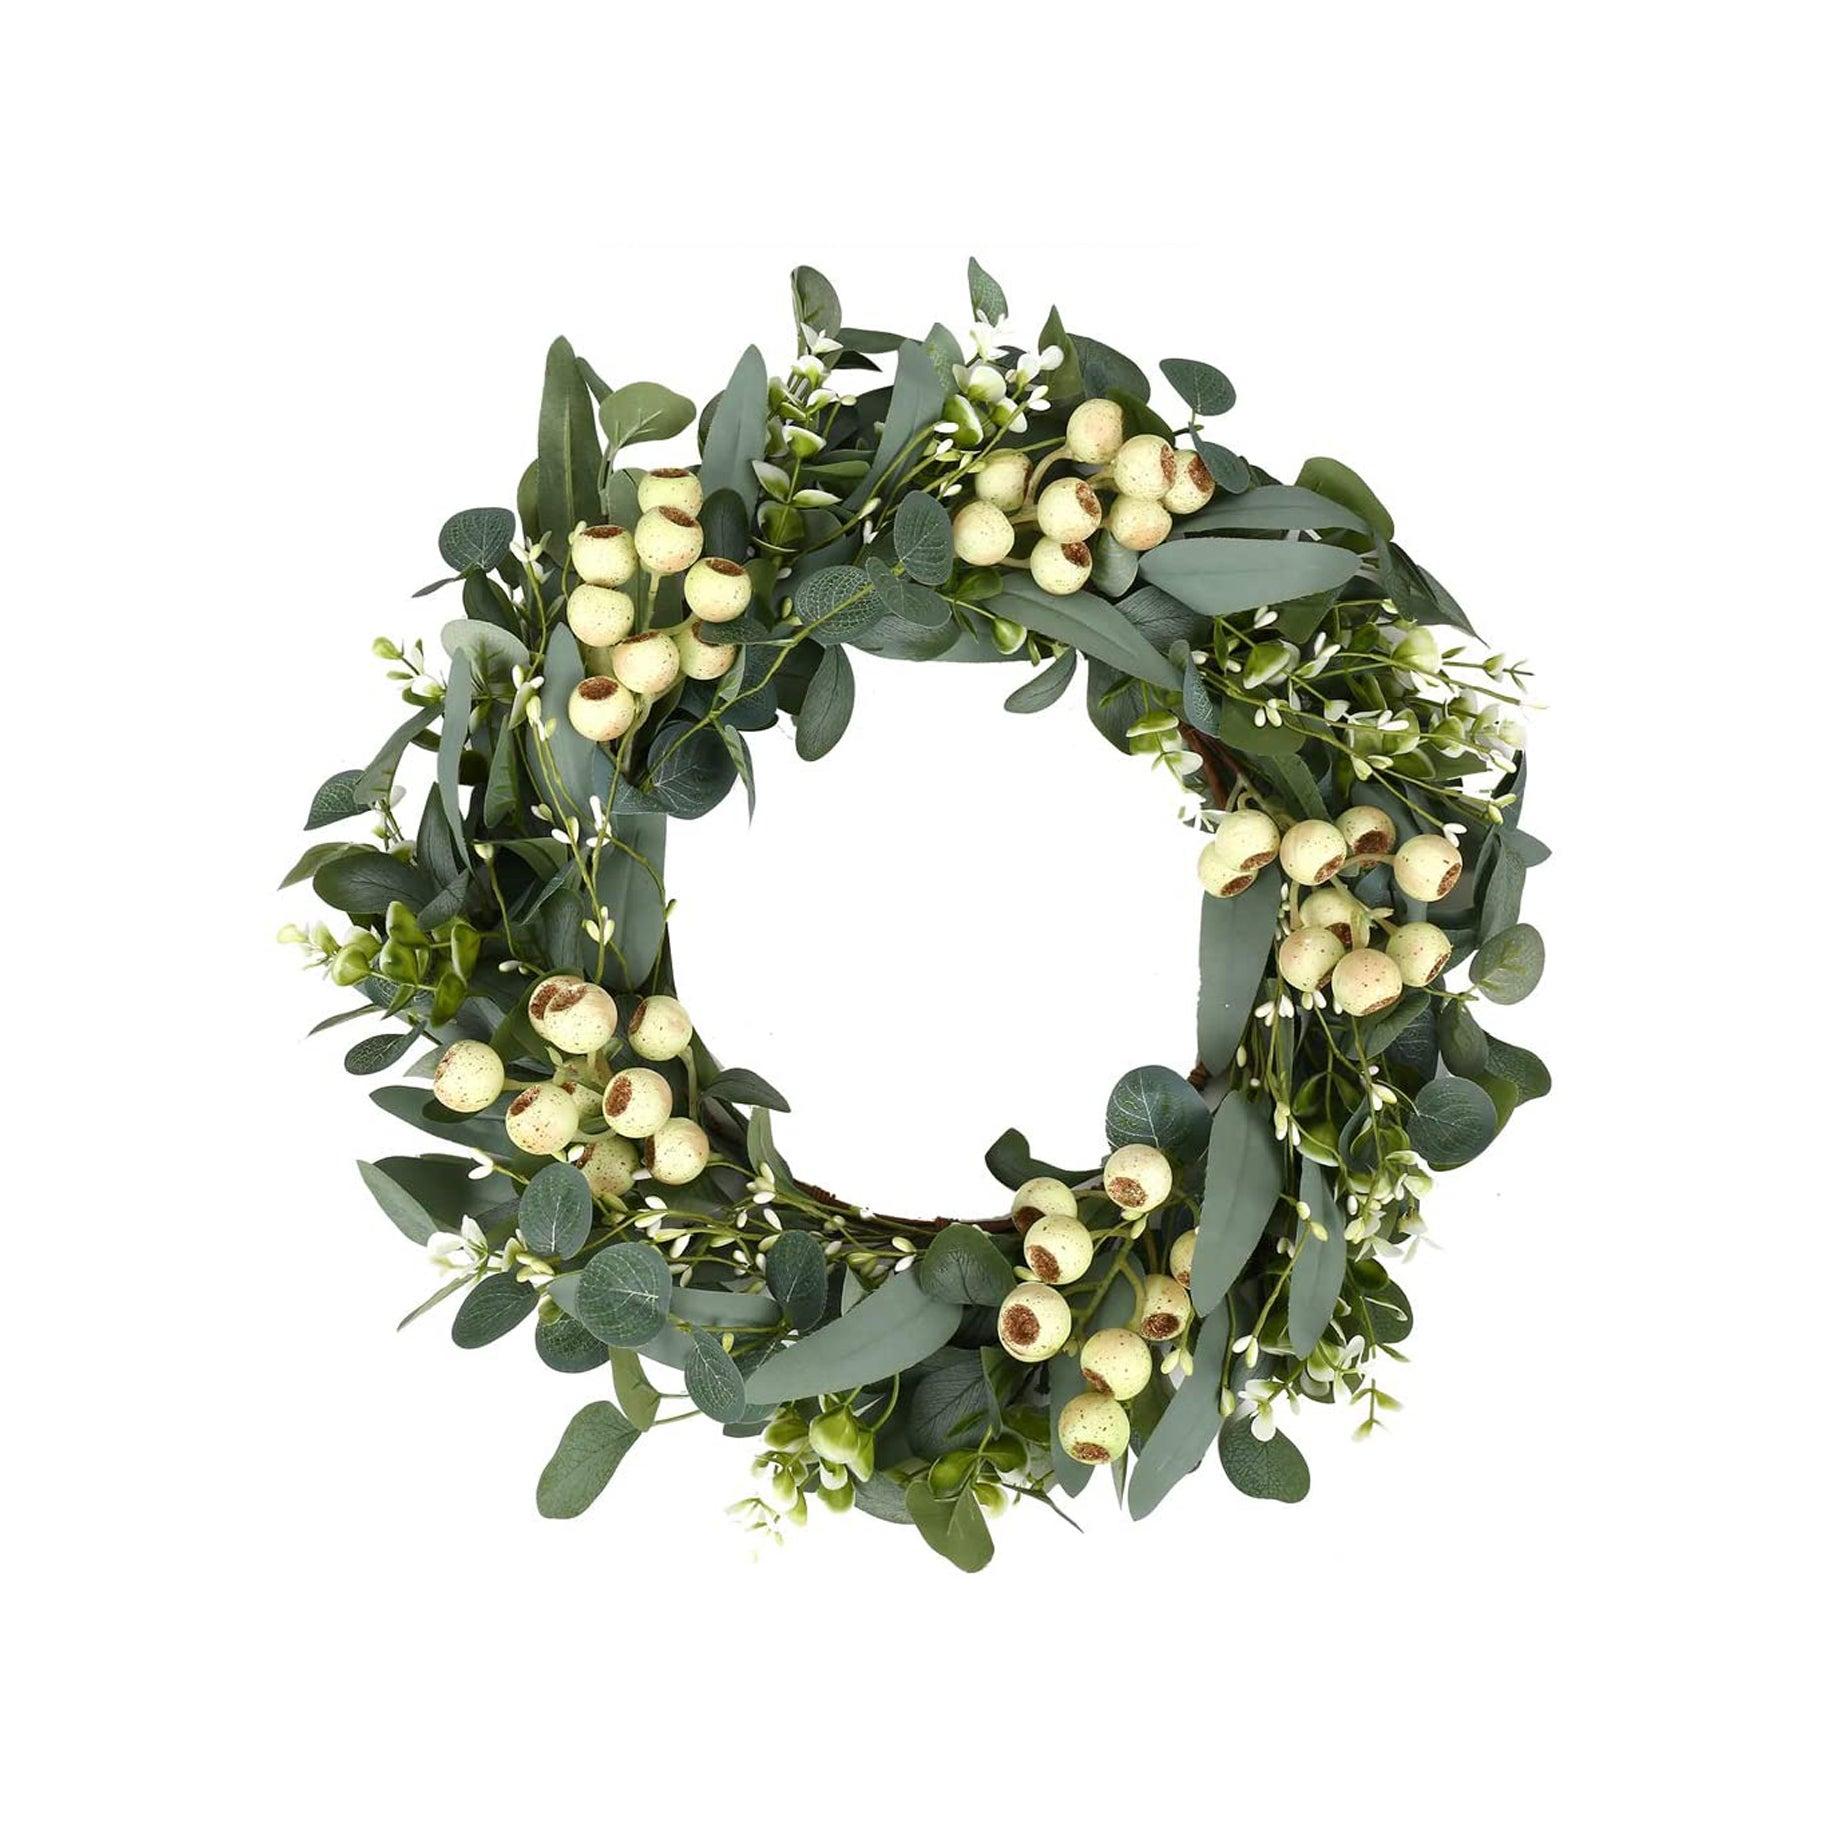 The Best Holiday Wreaths Option: Green Eucalyptus Wreath